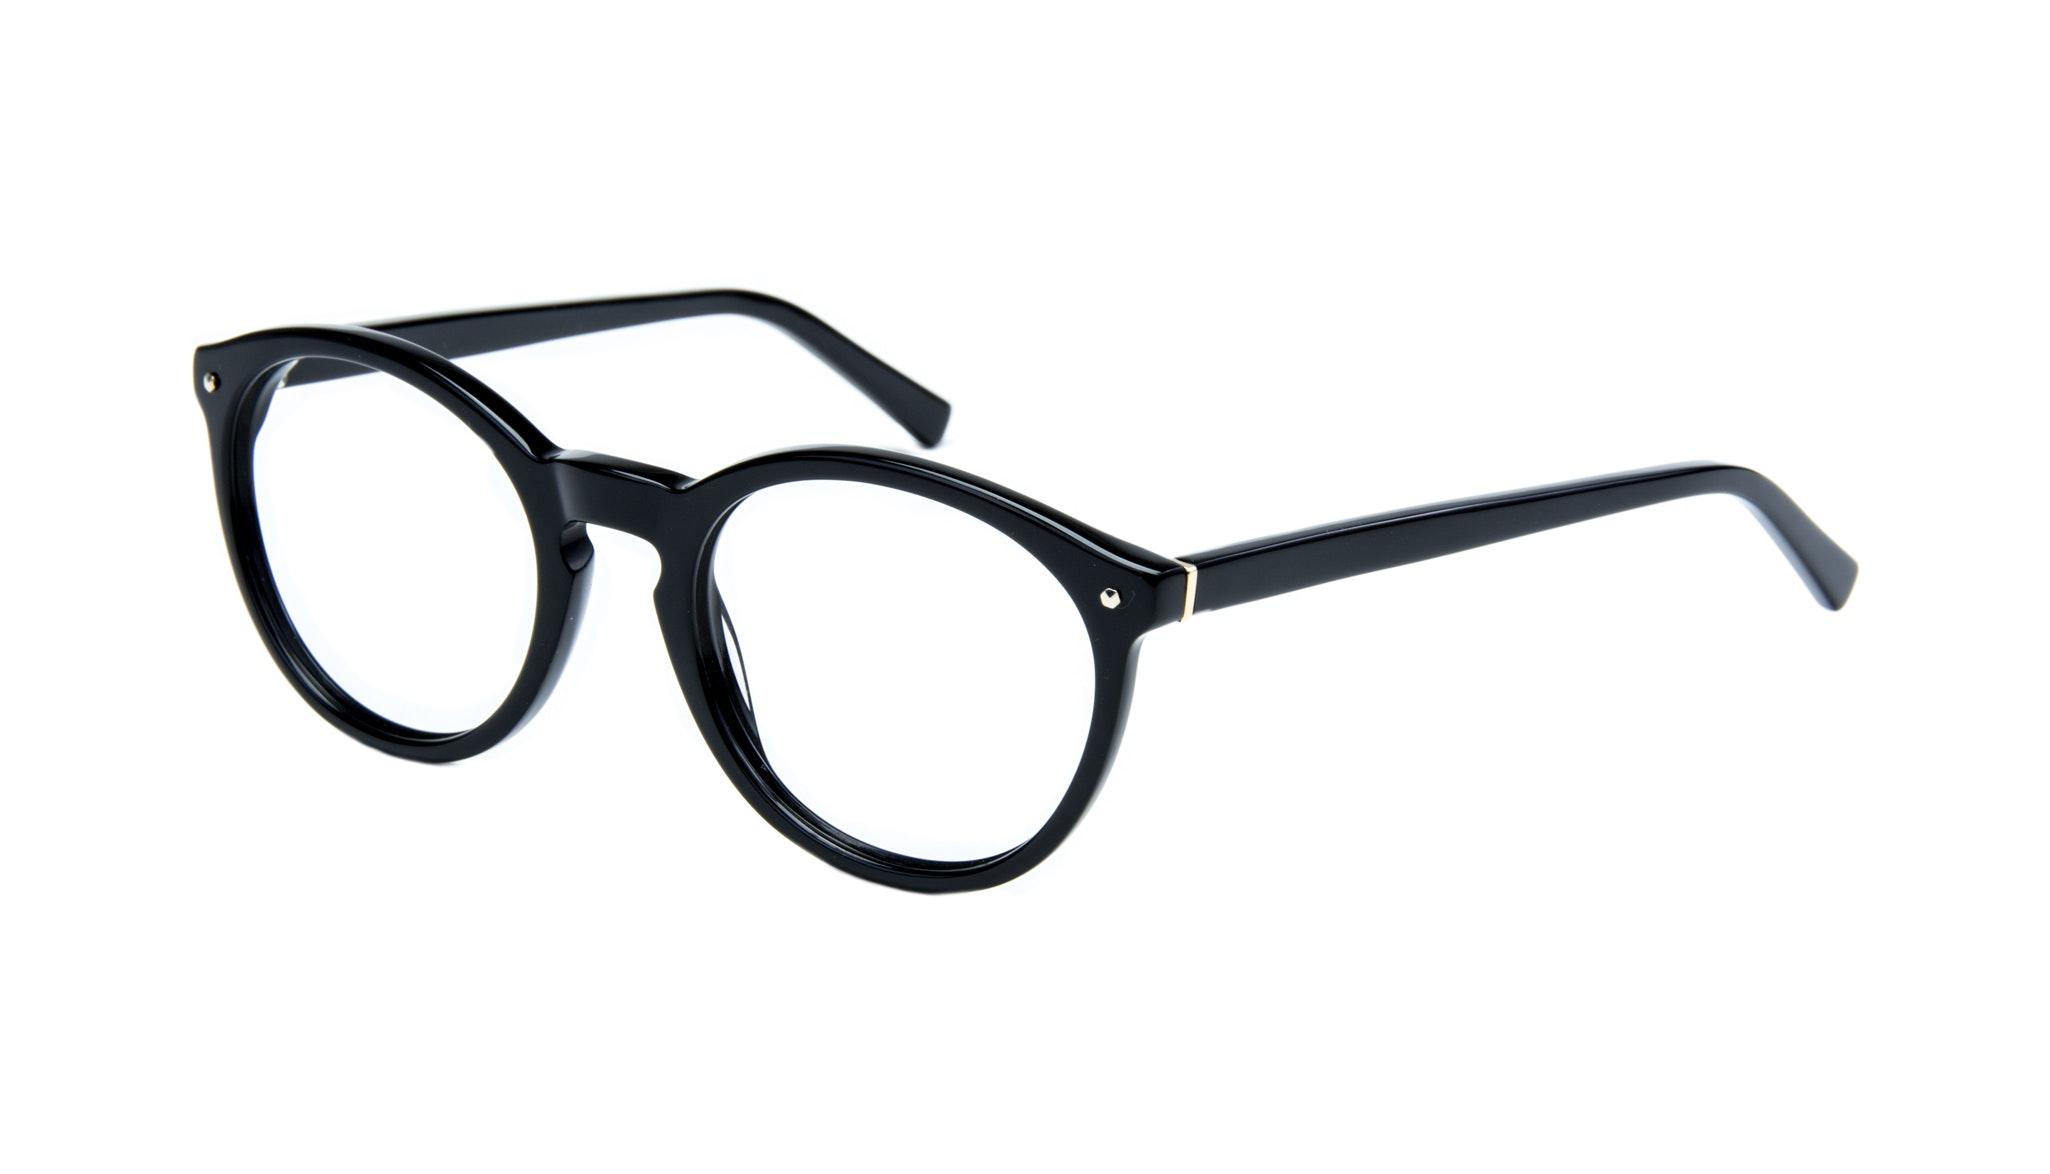 Affordable Fashion Glasses Round Eyeglasses Women Glow Onyx Tilt